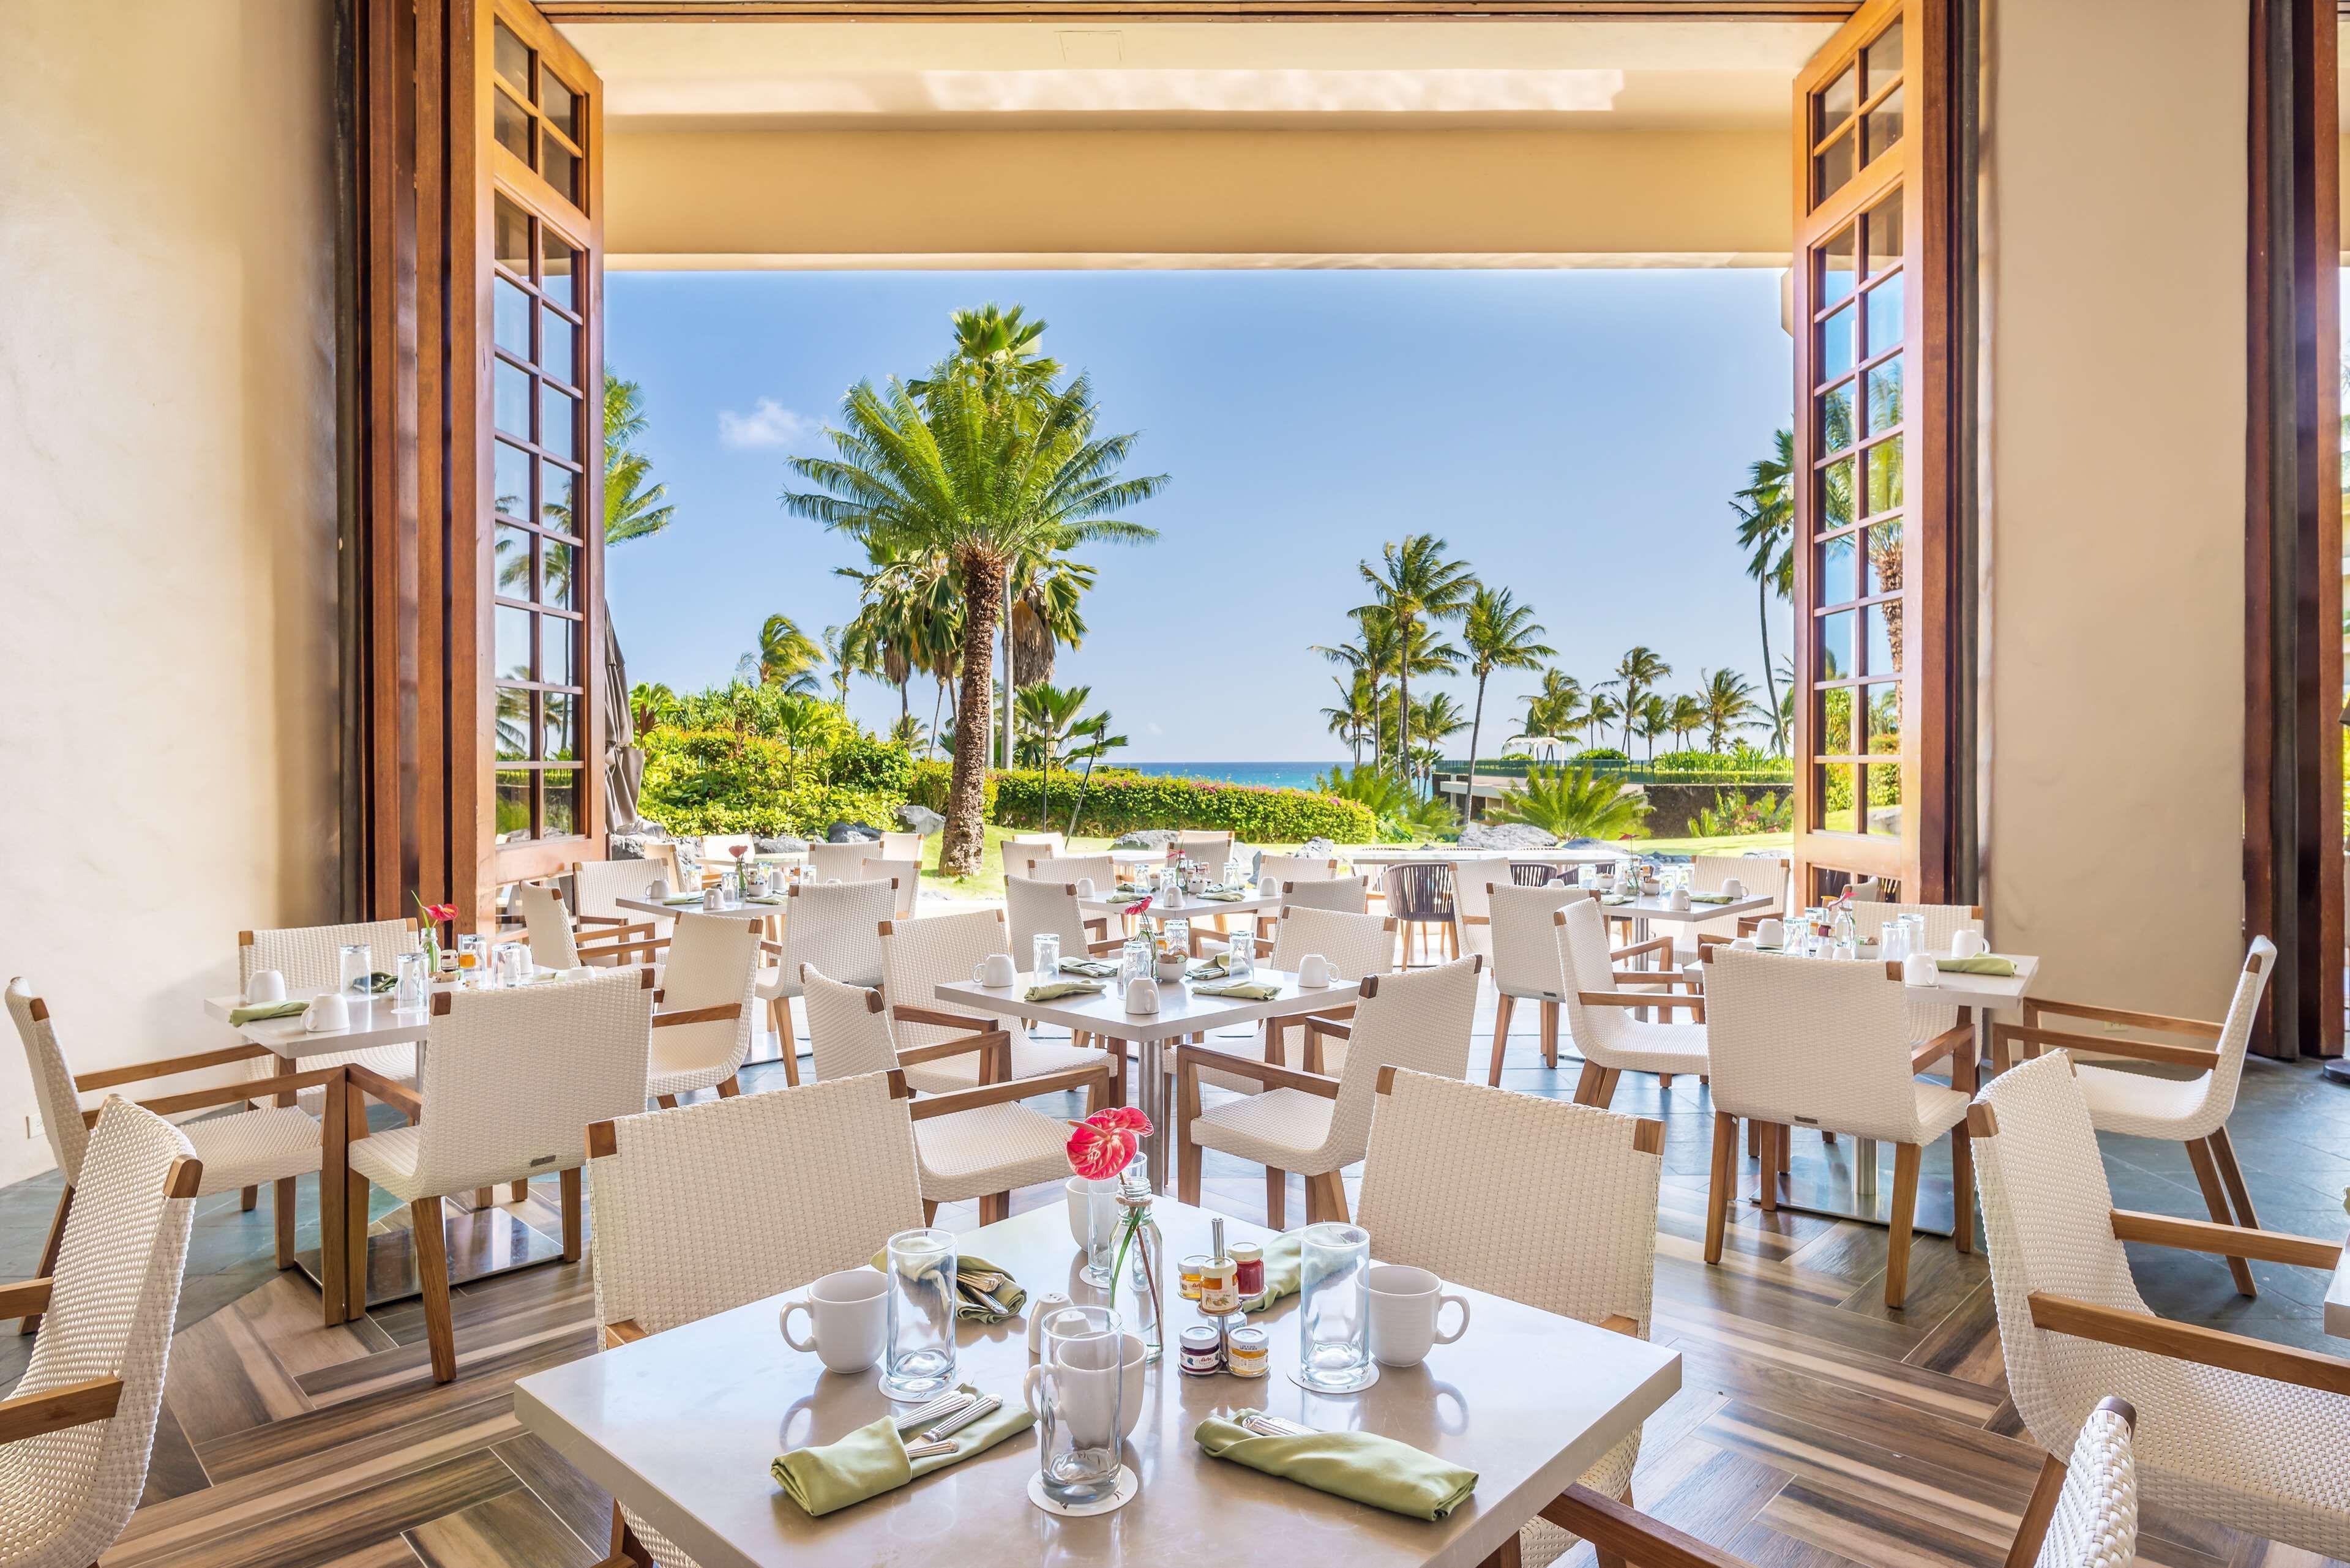 Courtesy of Grand Hyatt Kauai Resort and Spa / Expedia